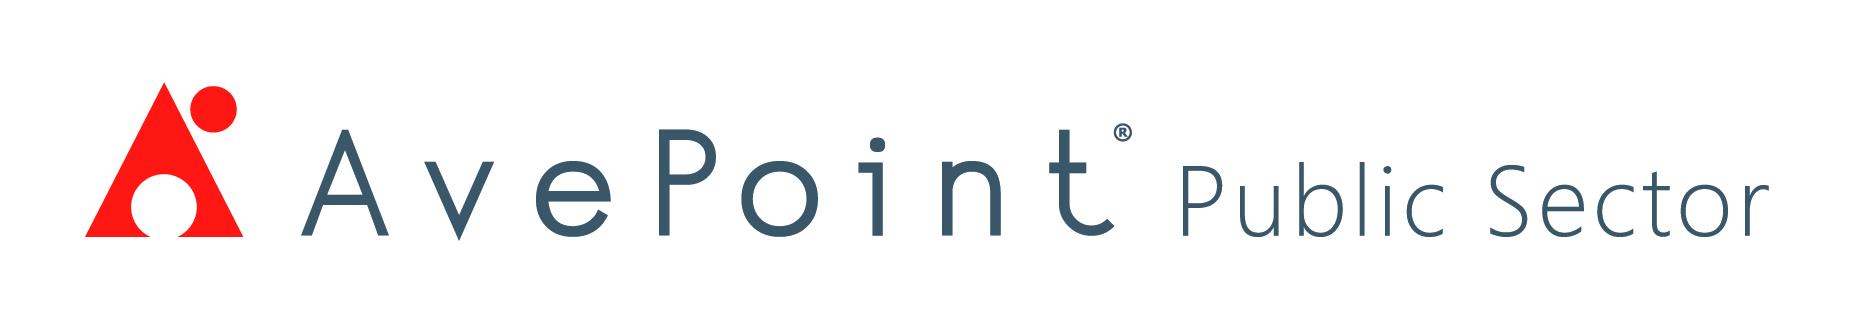 AvePoint_Public Sector Logo.jpg